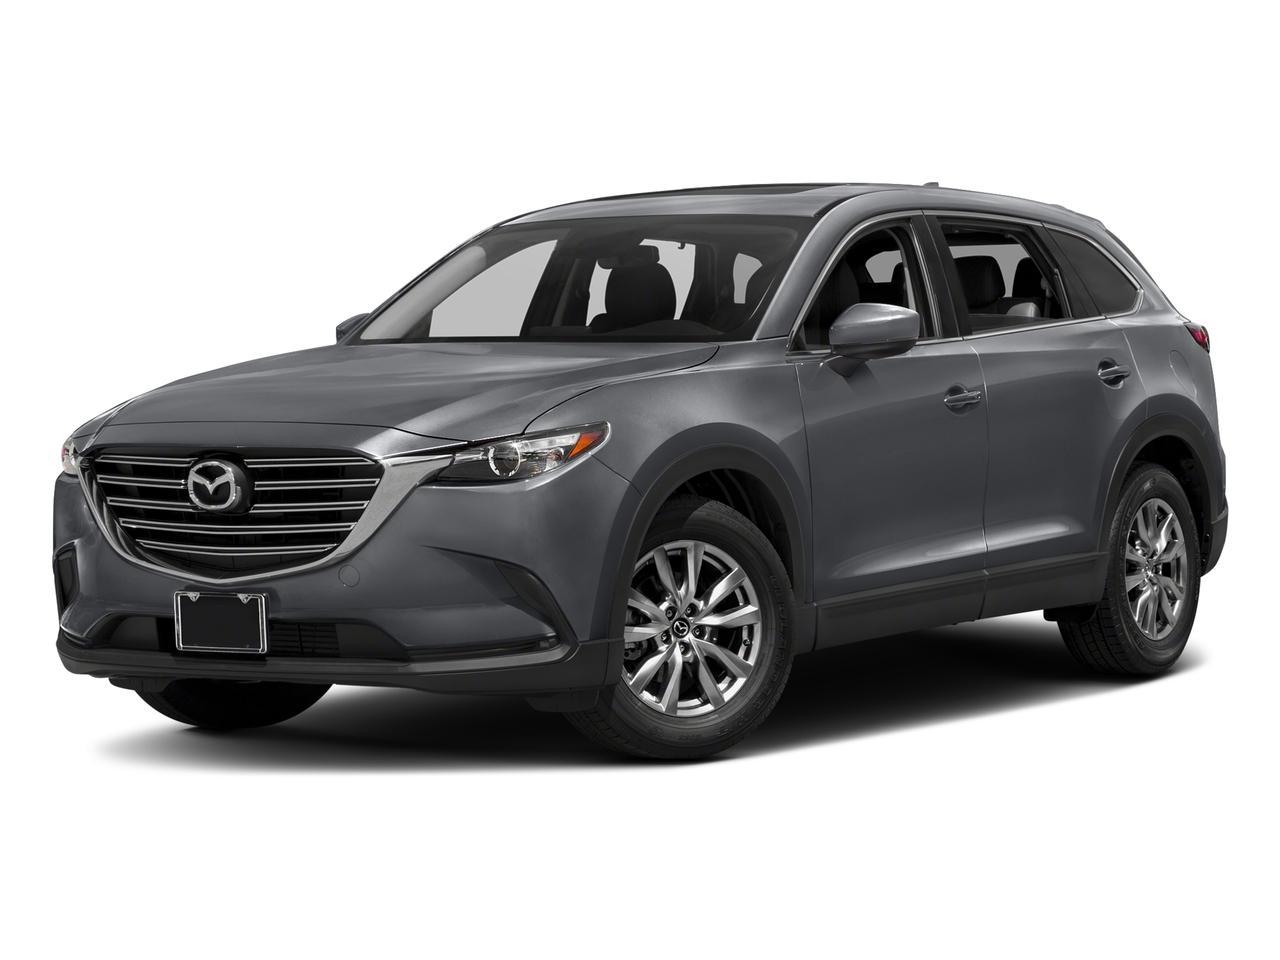 2016 Mazda CX-9 Vehicle Photo in Midland, TX 79703